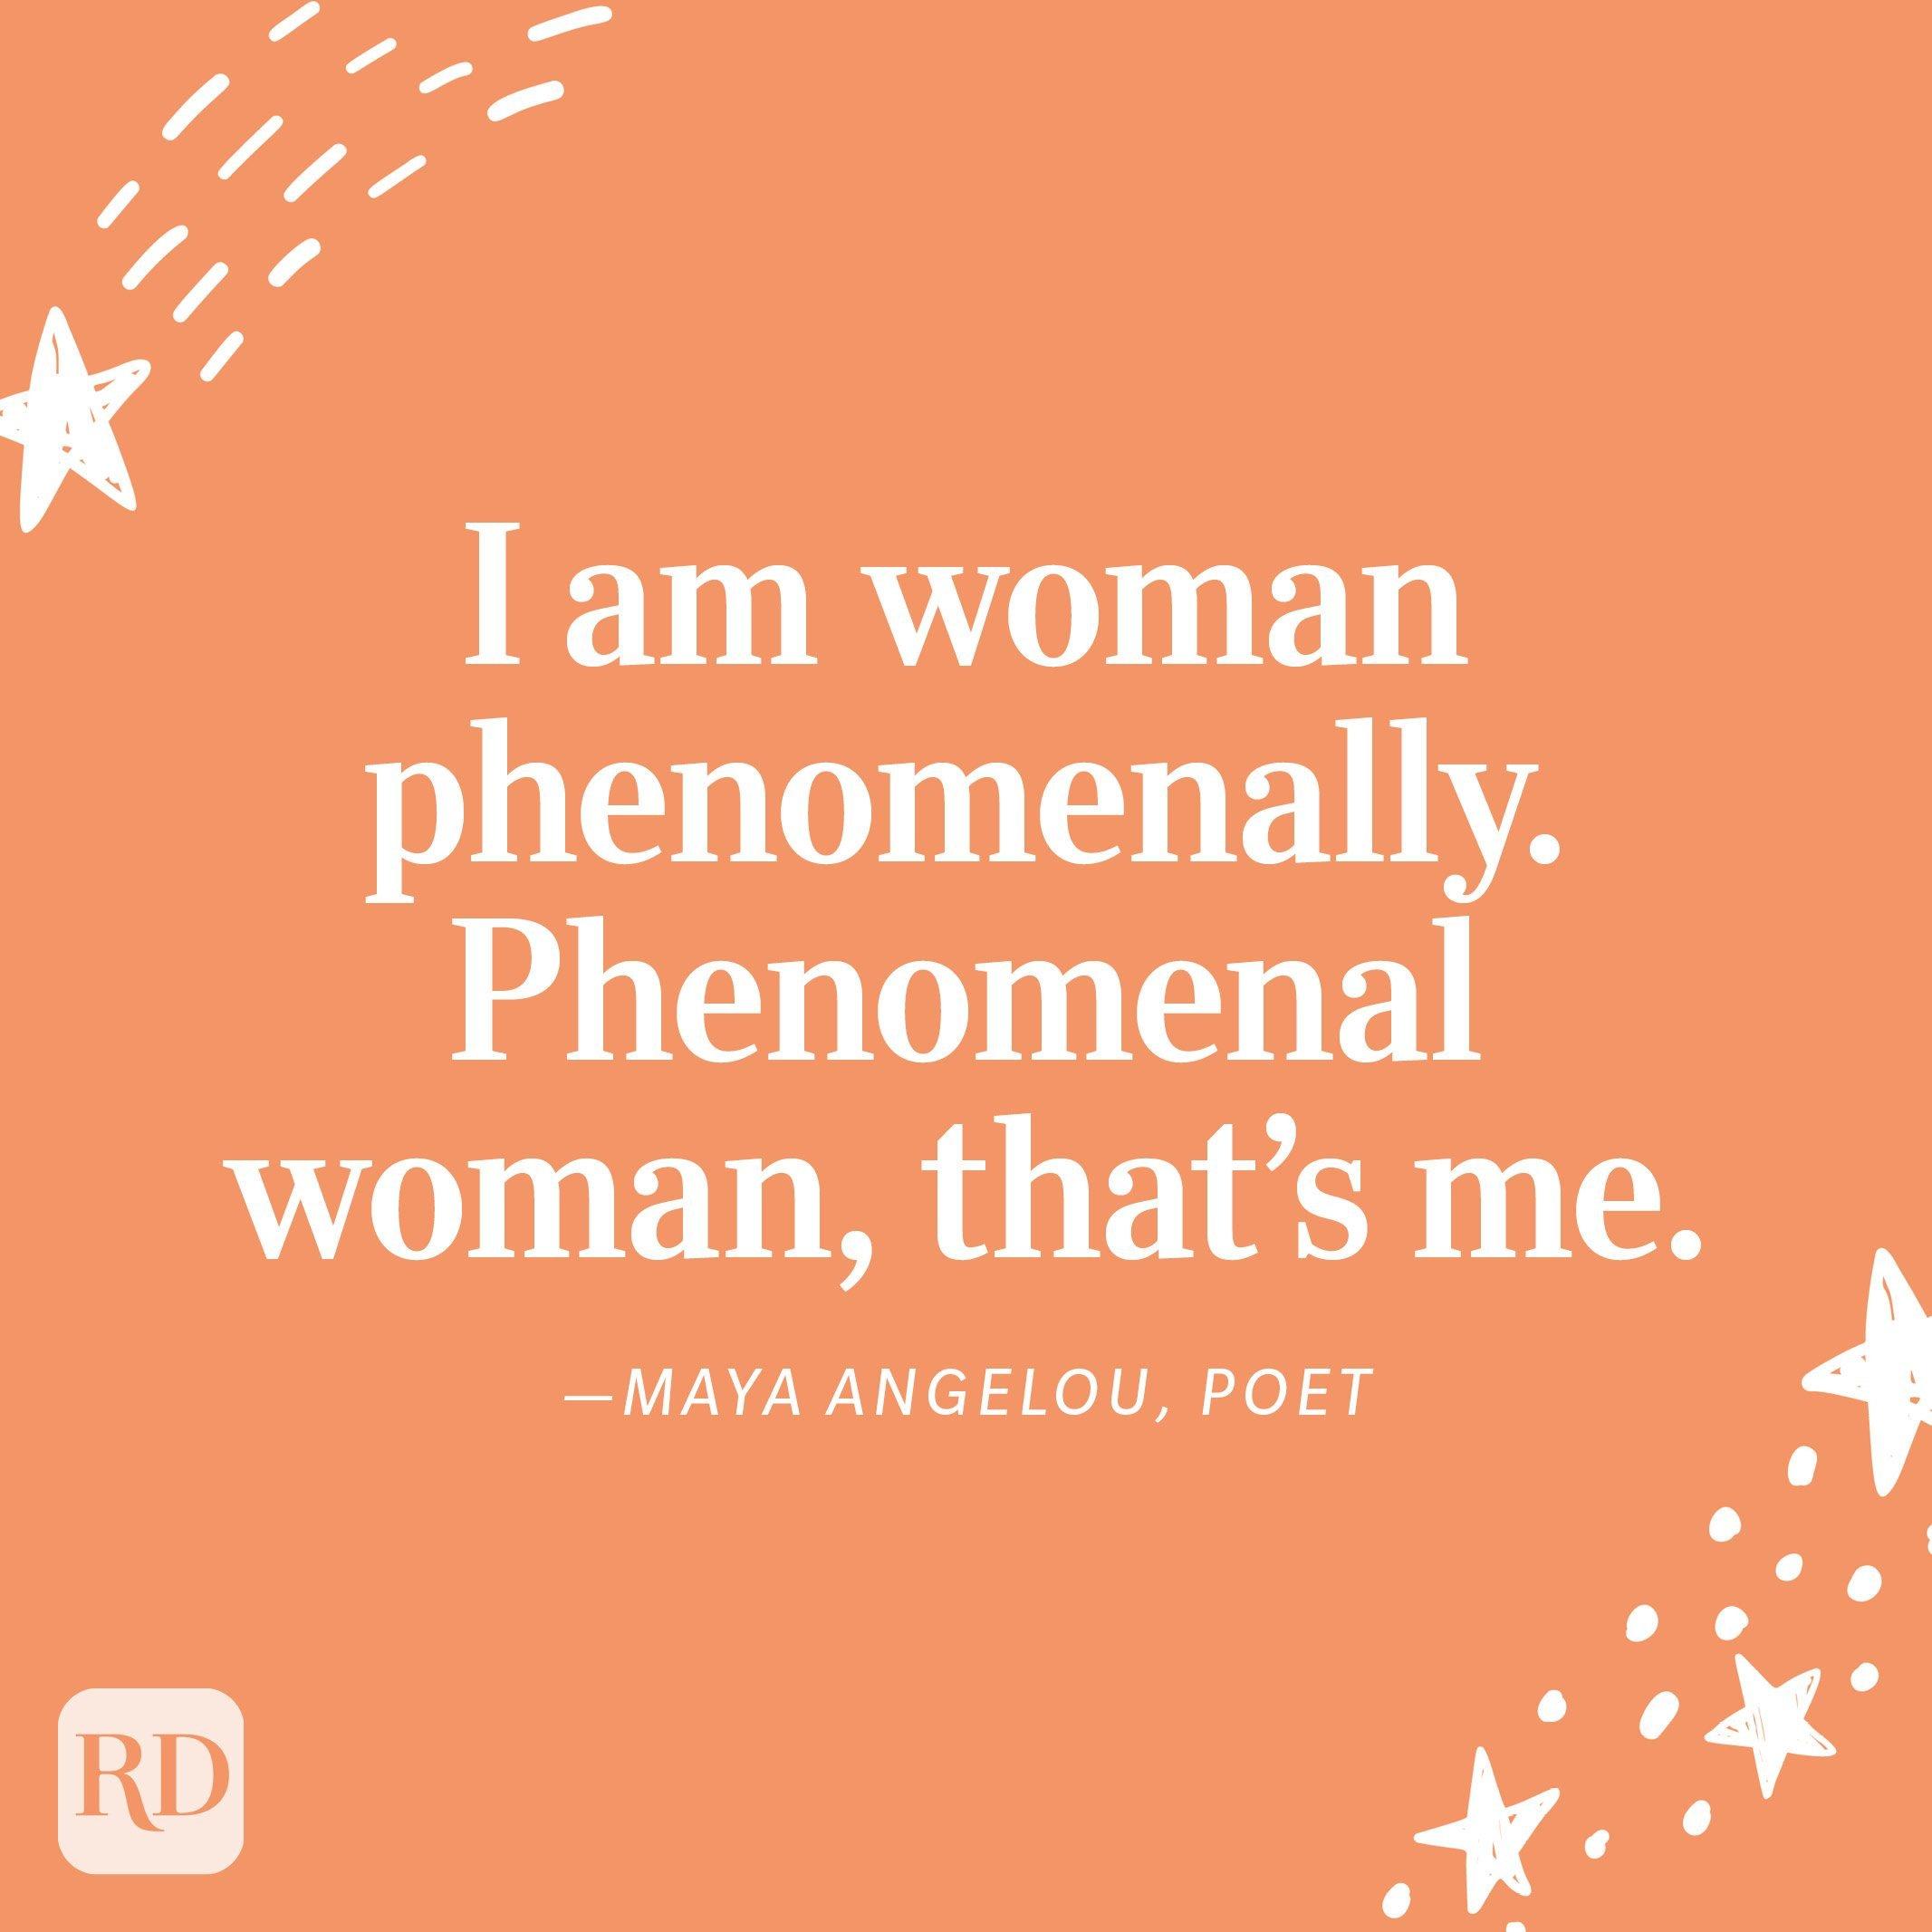 """I am woman phenomenally. Phenomenal woman, that's me."" —Maya Angelou, poet"